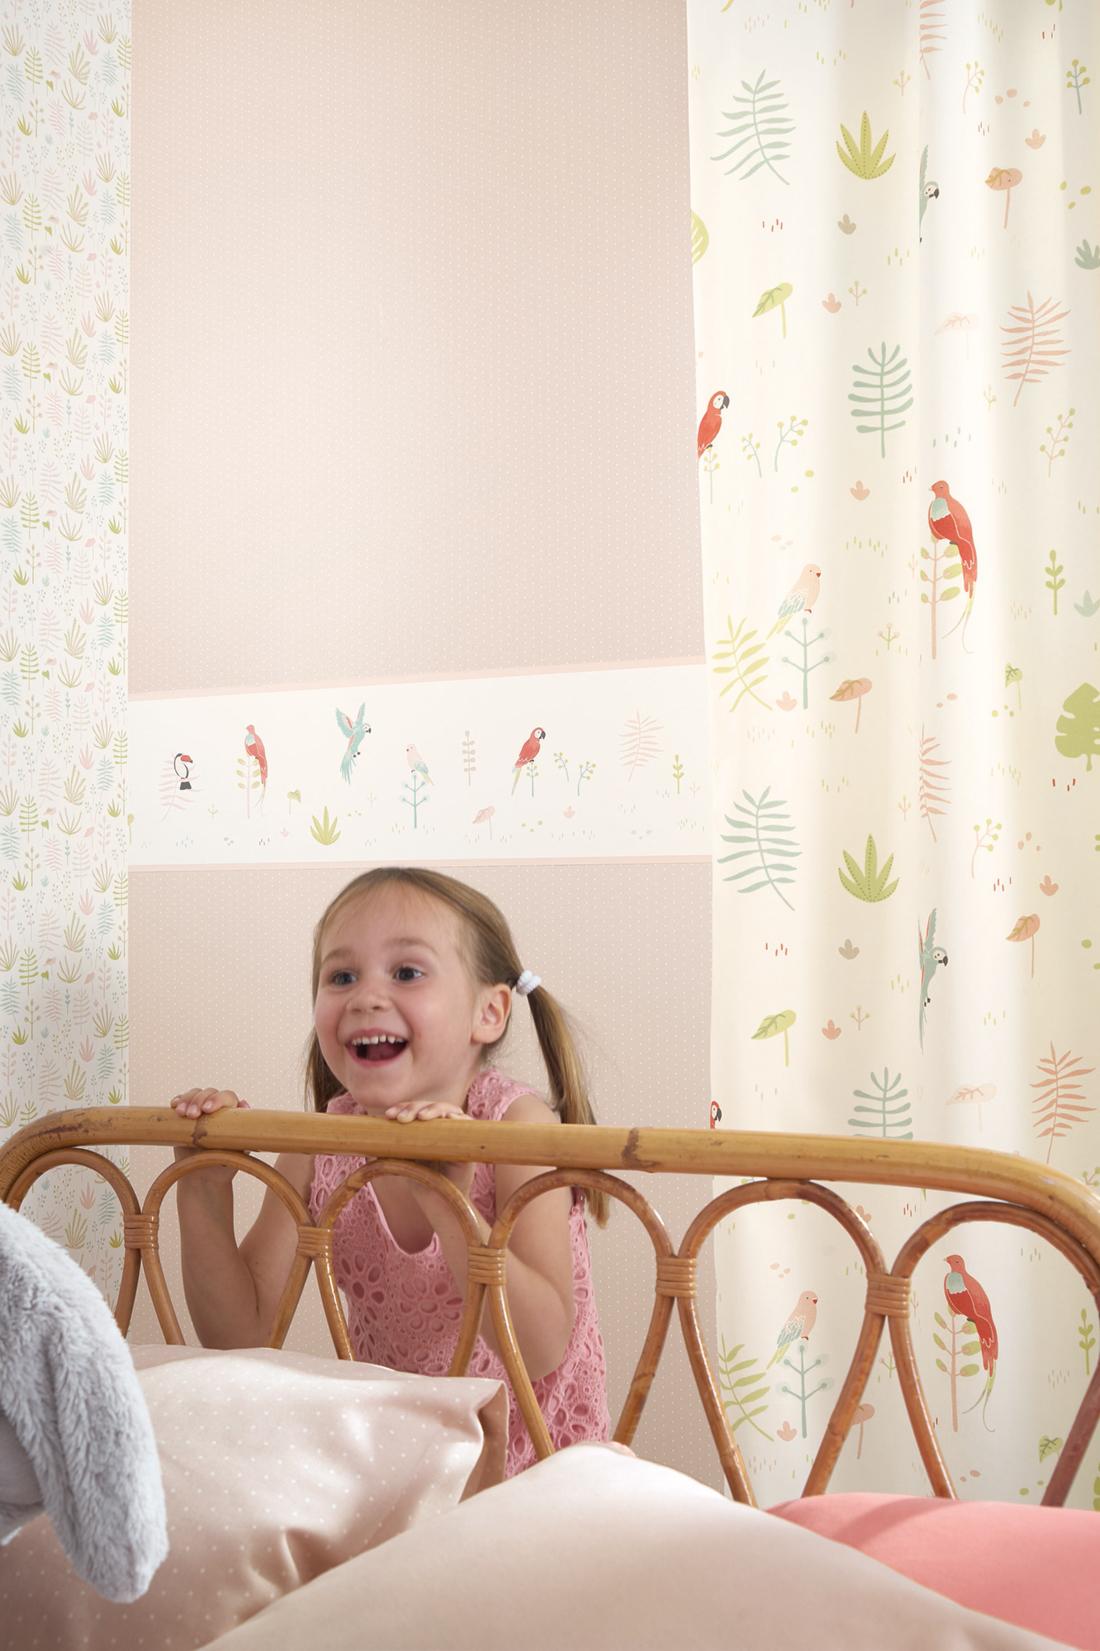 Frise enfant Tropical rose - Happy Dreams de Casadéco AMB 2 | Réf. HPDM82873235